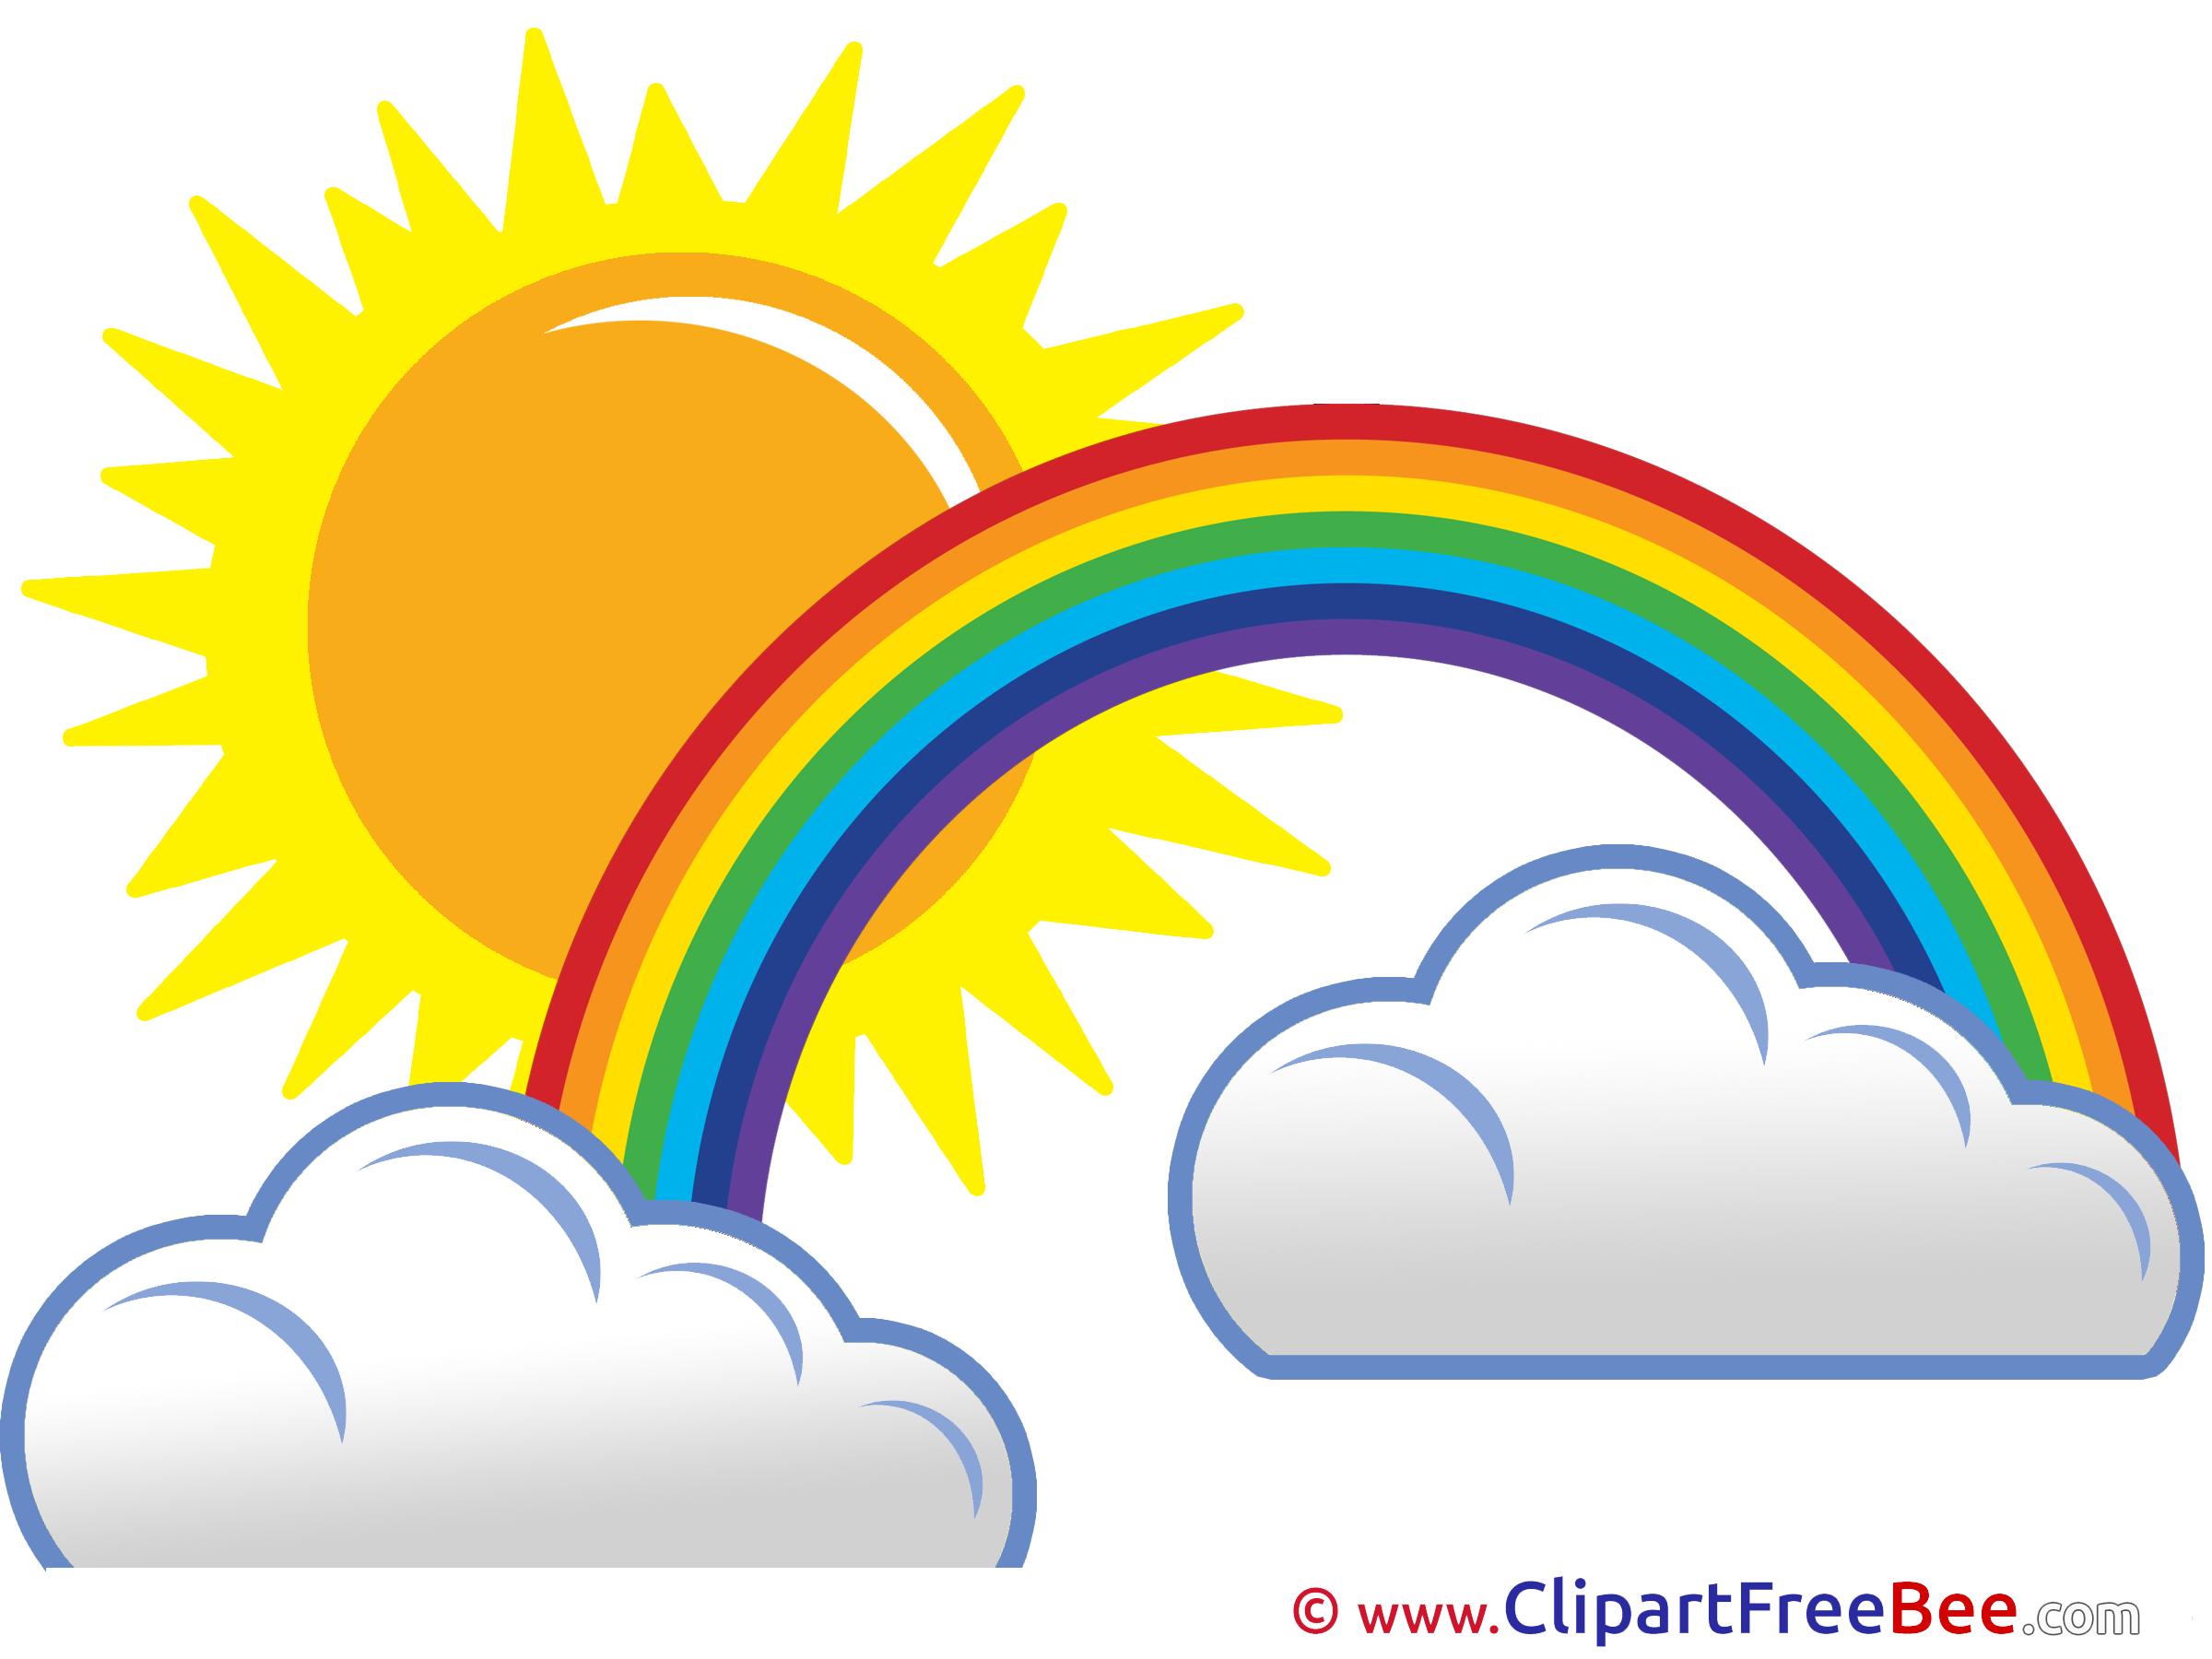 Sunny Day Rainbow Clouds Sun Pics free Illustration